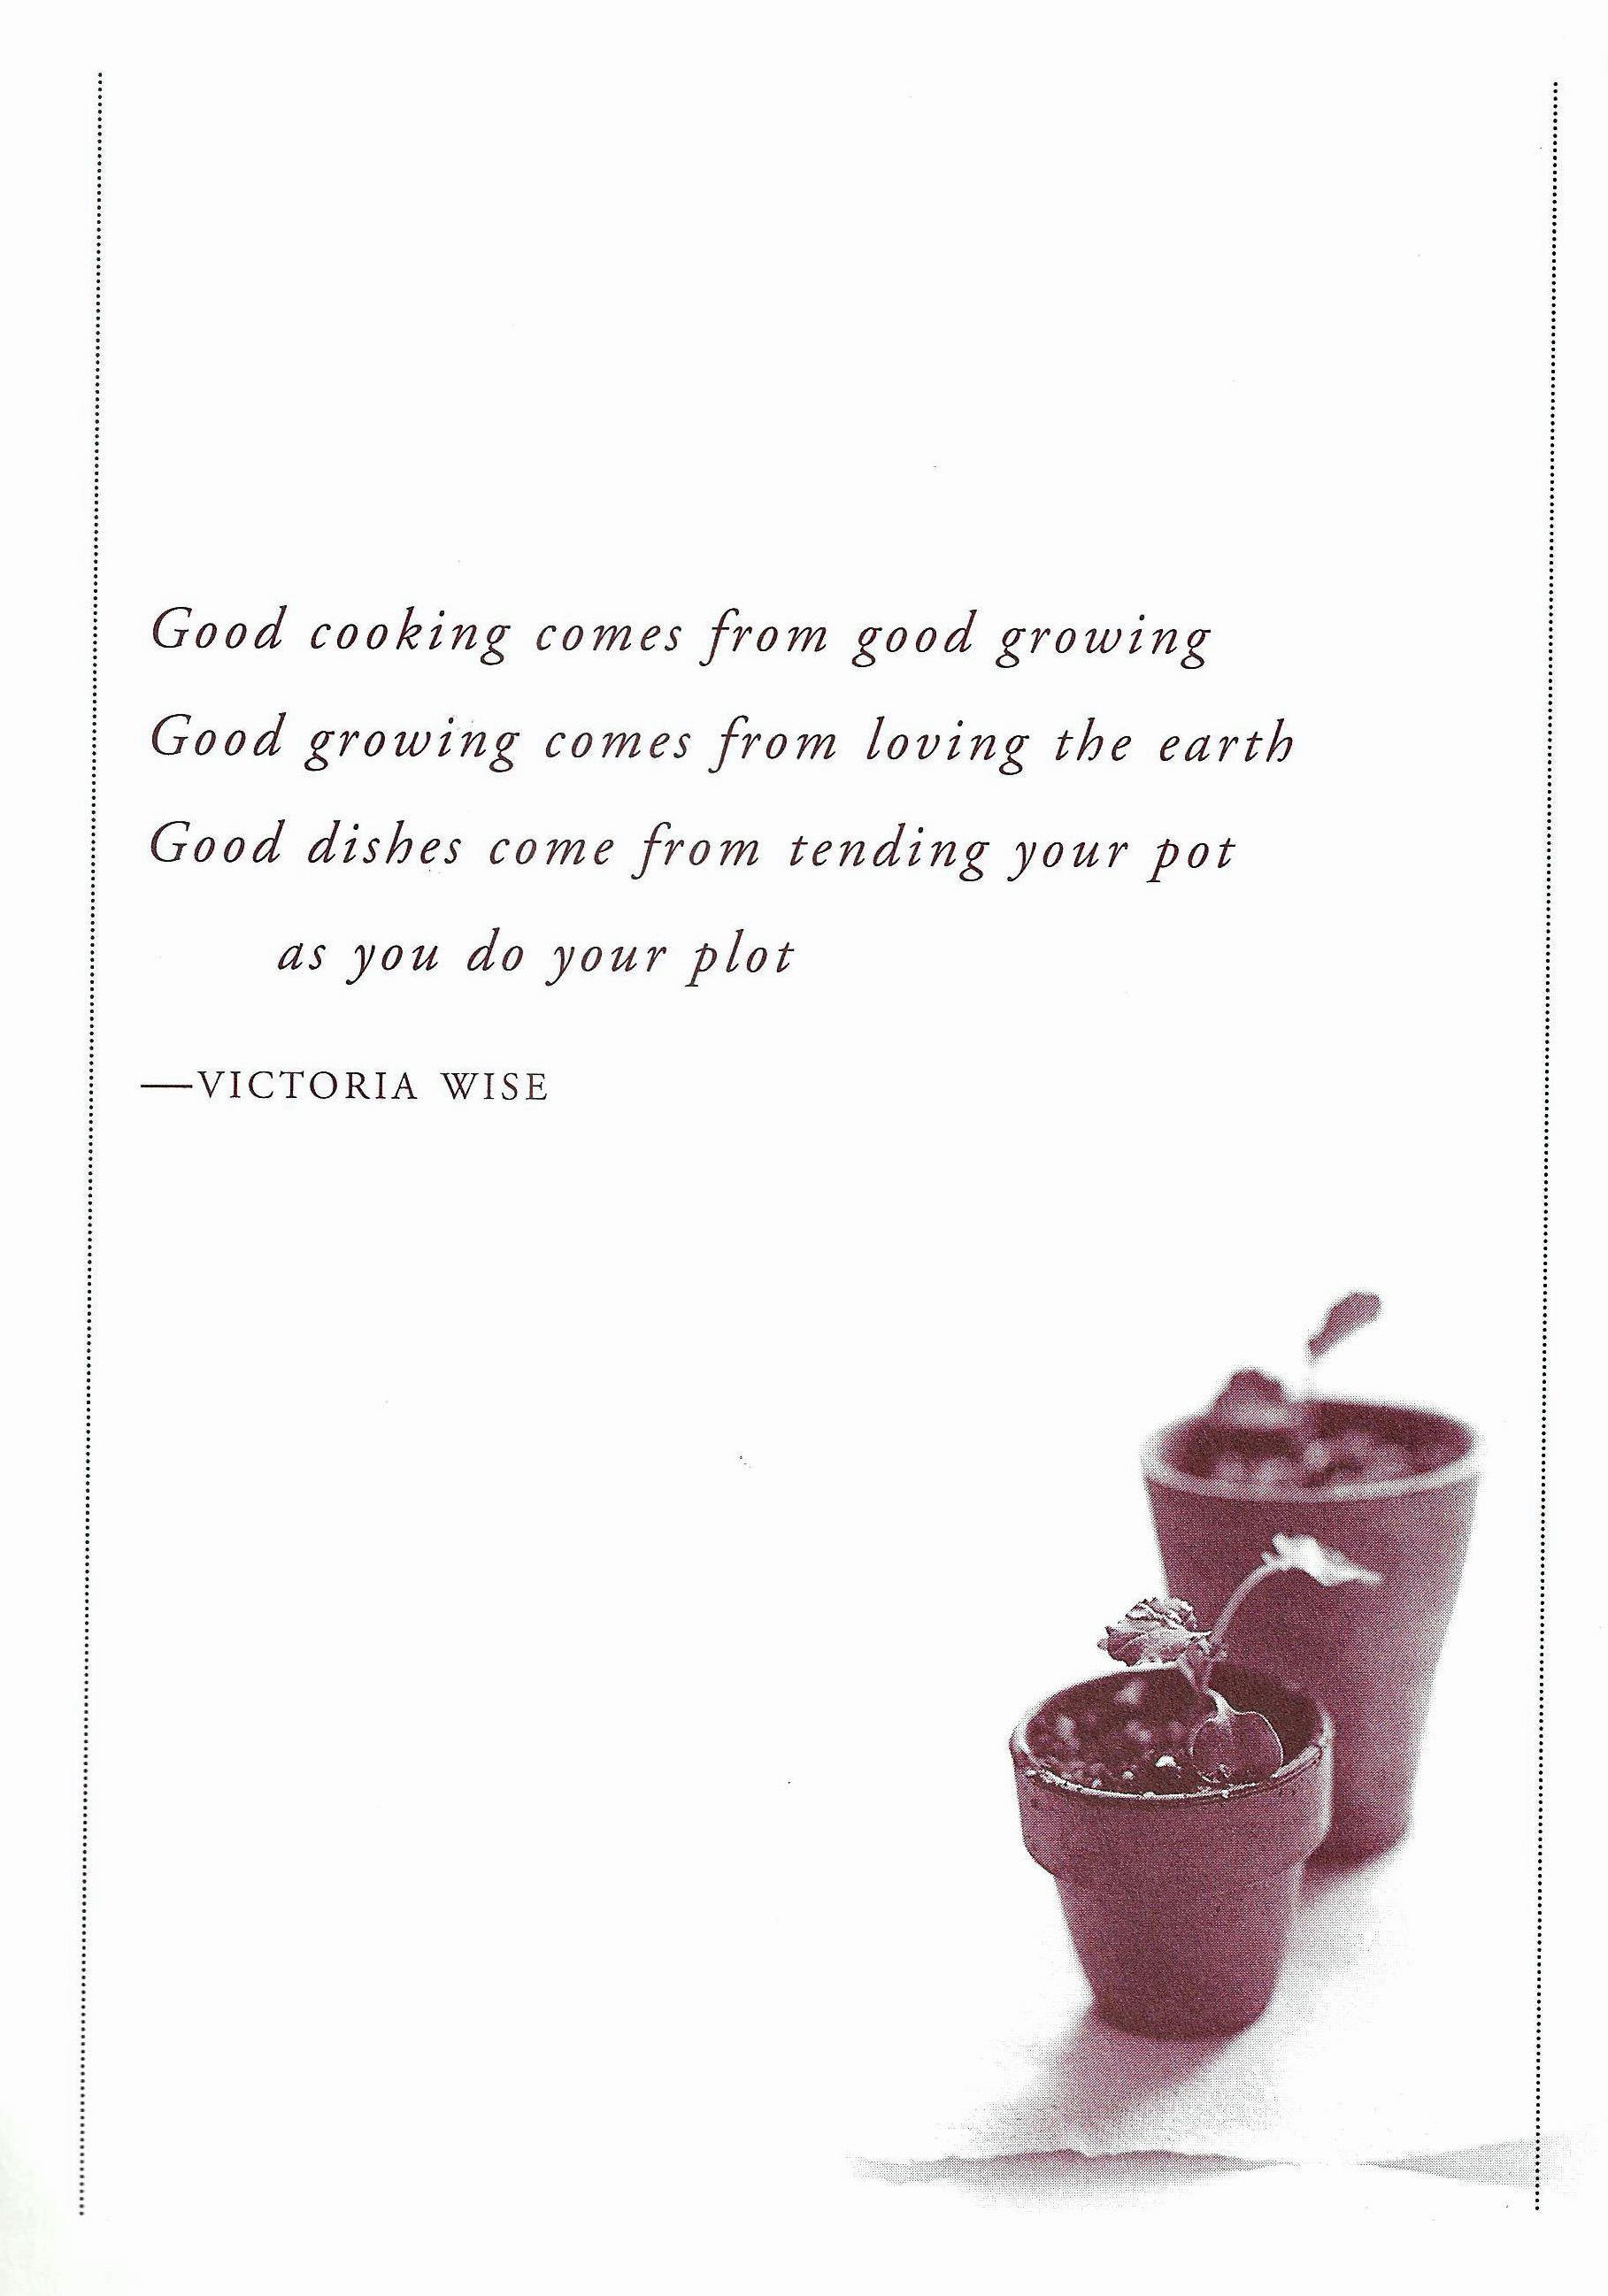 Smith&Hawken-Gardeners-Cookbook-opening-Victoria-Wise 001